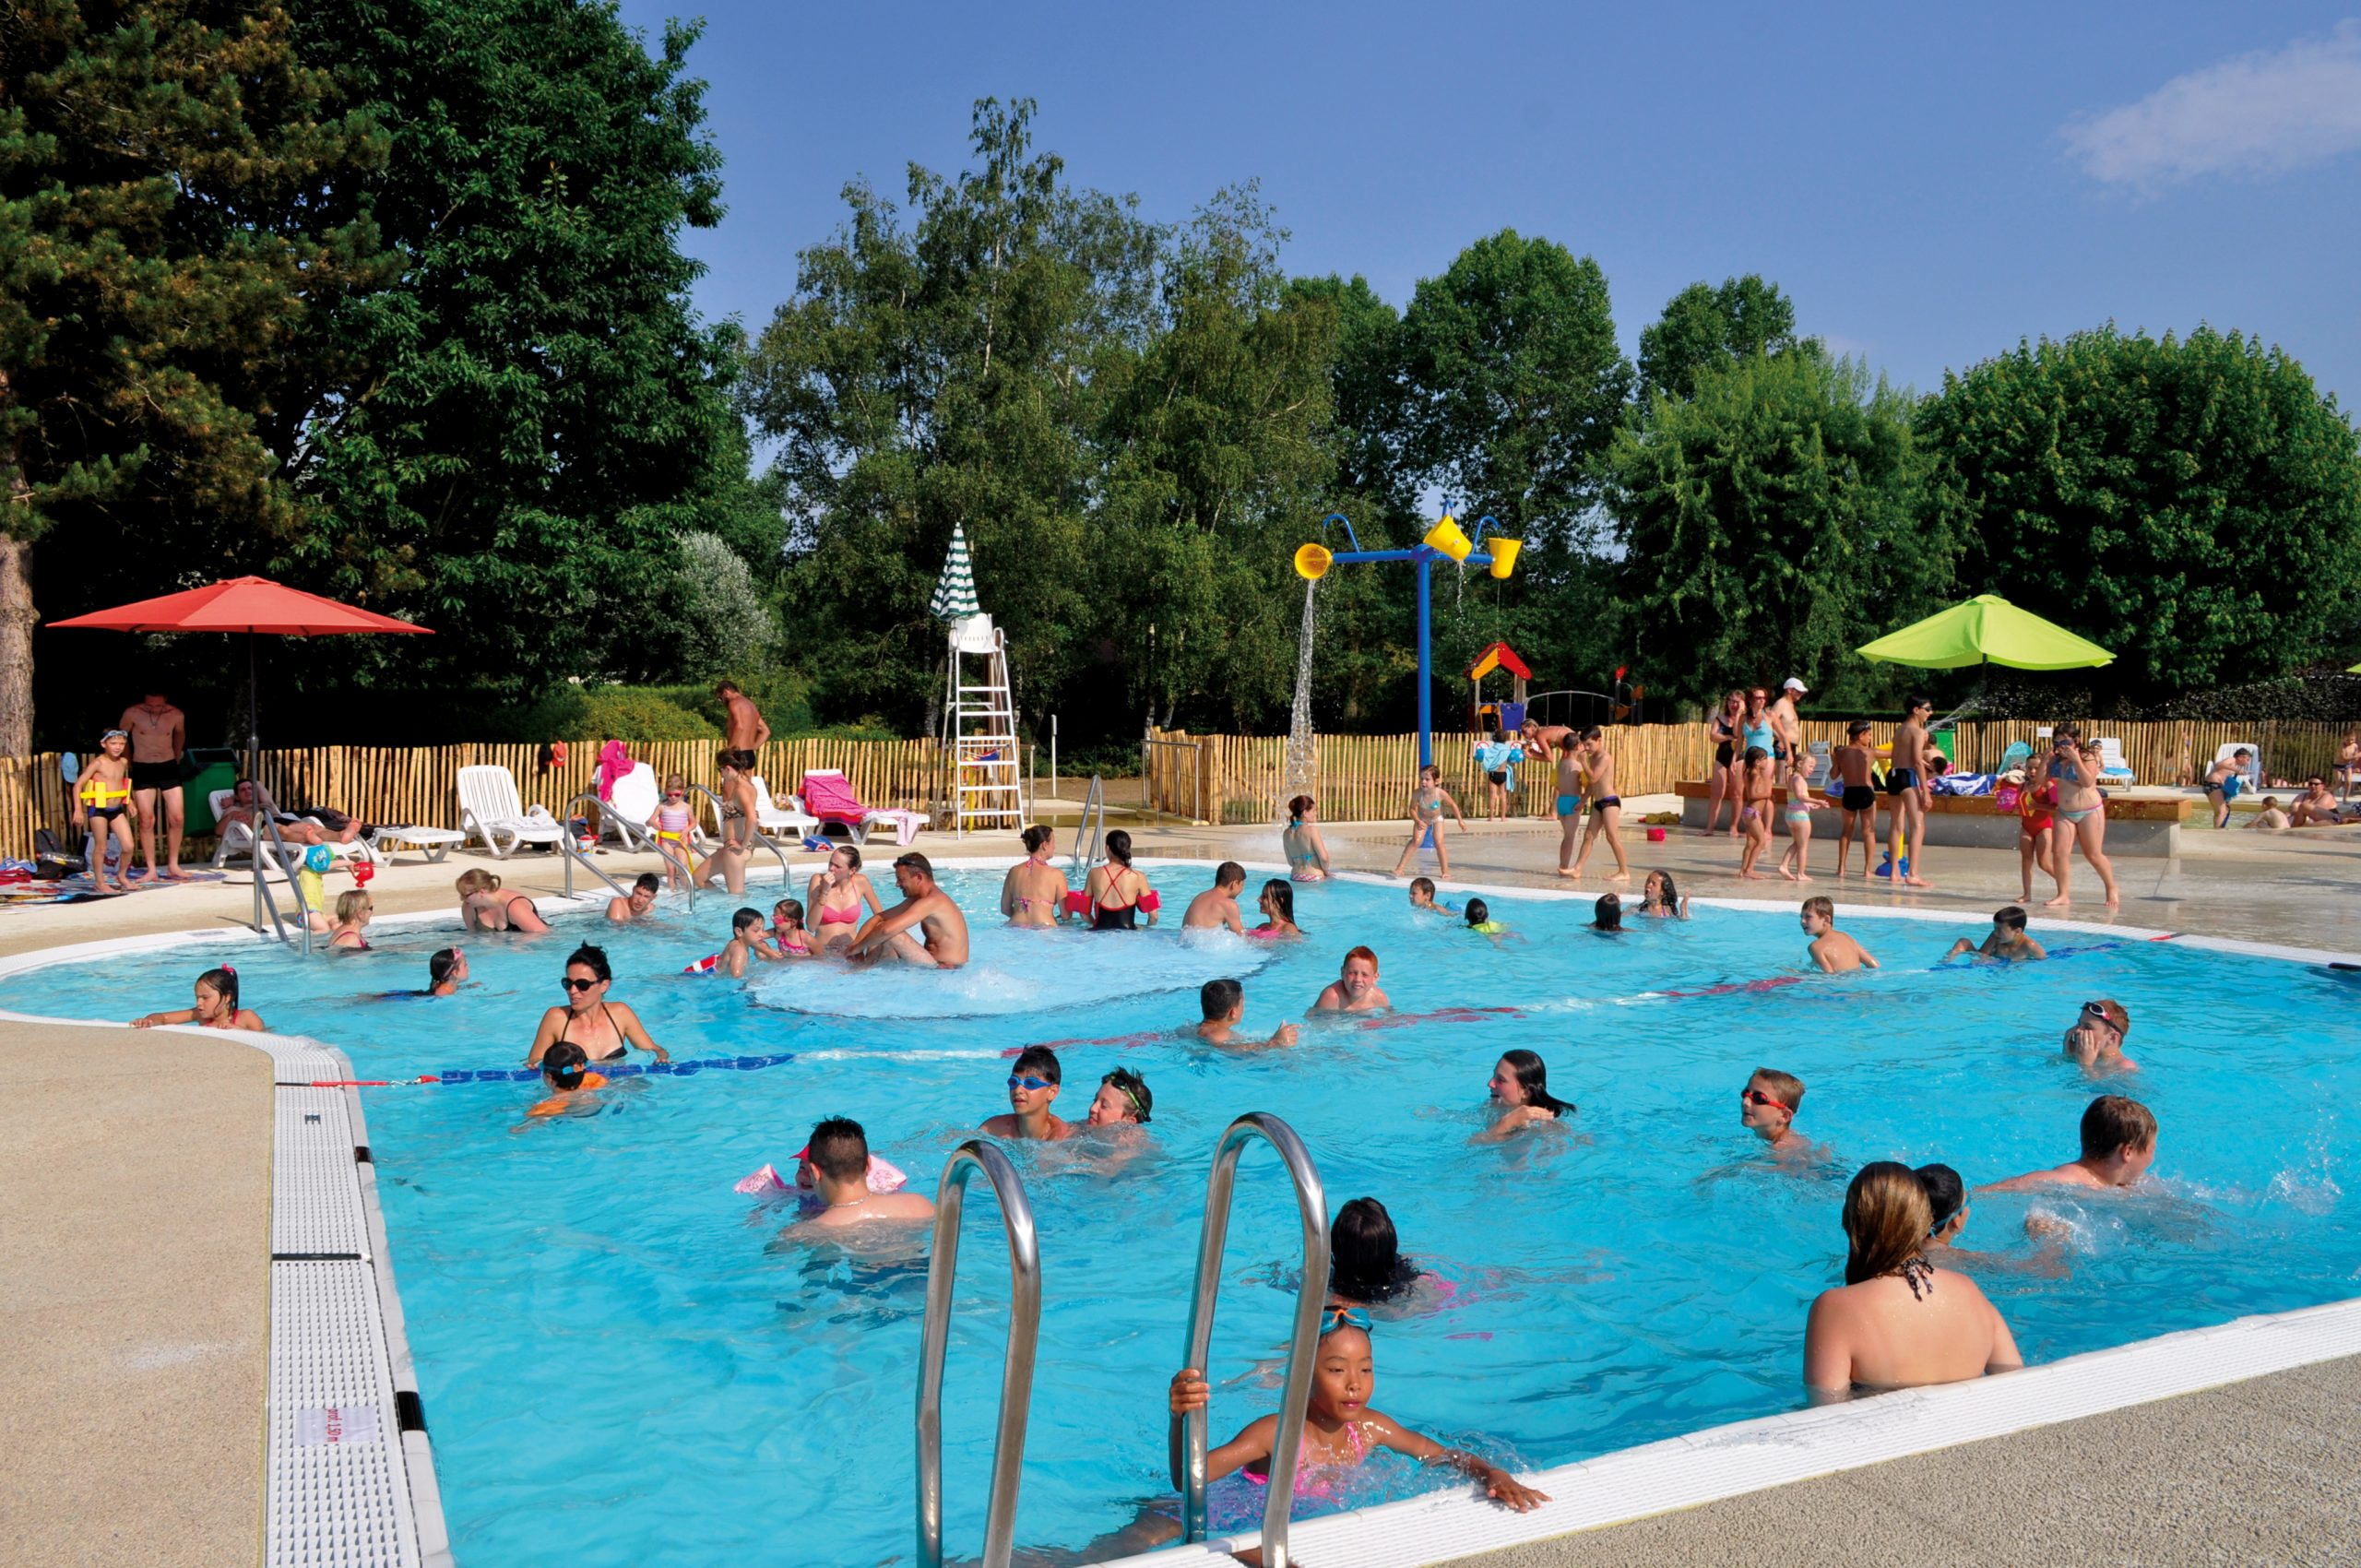 Piscine De Saint-Yorre - Stade Aquatique pour Piscine Bellerive Horaire